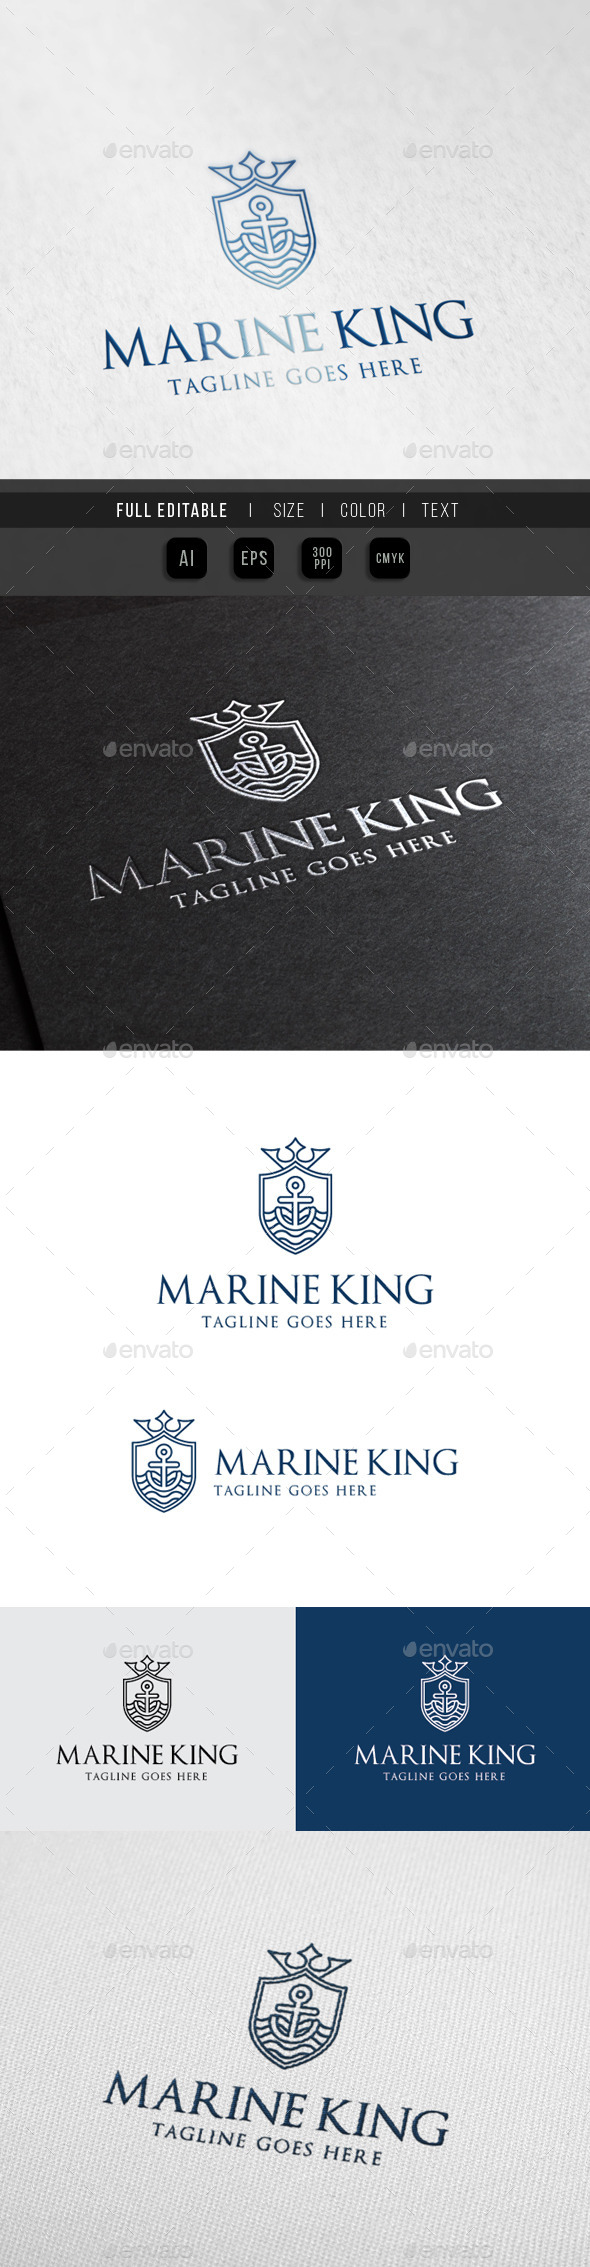 Marine King - Royal Ocean - Crests Logo Templates